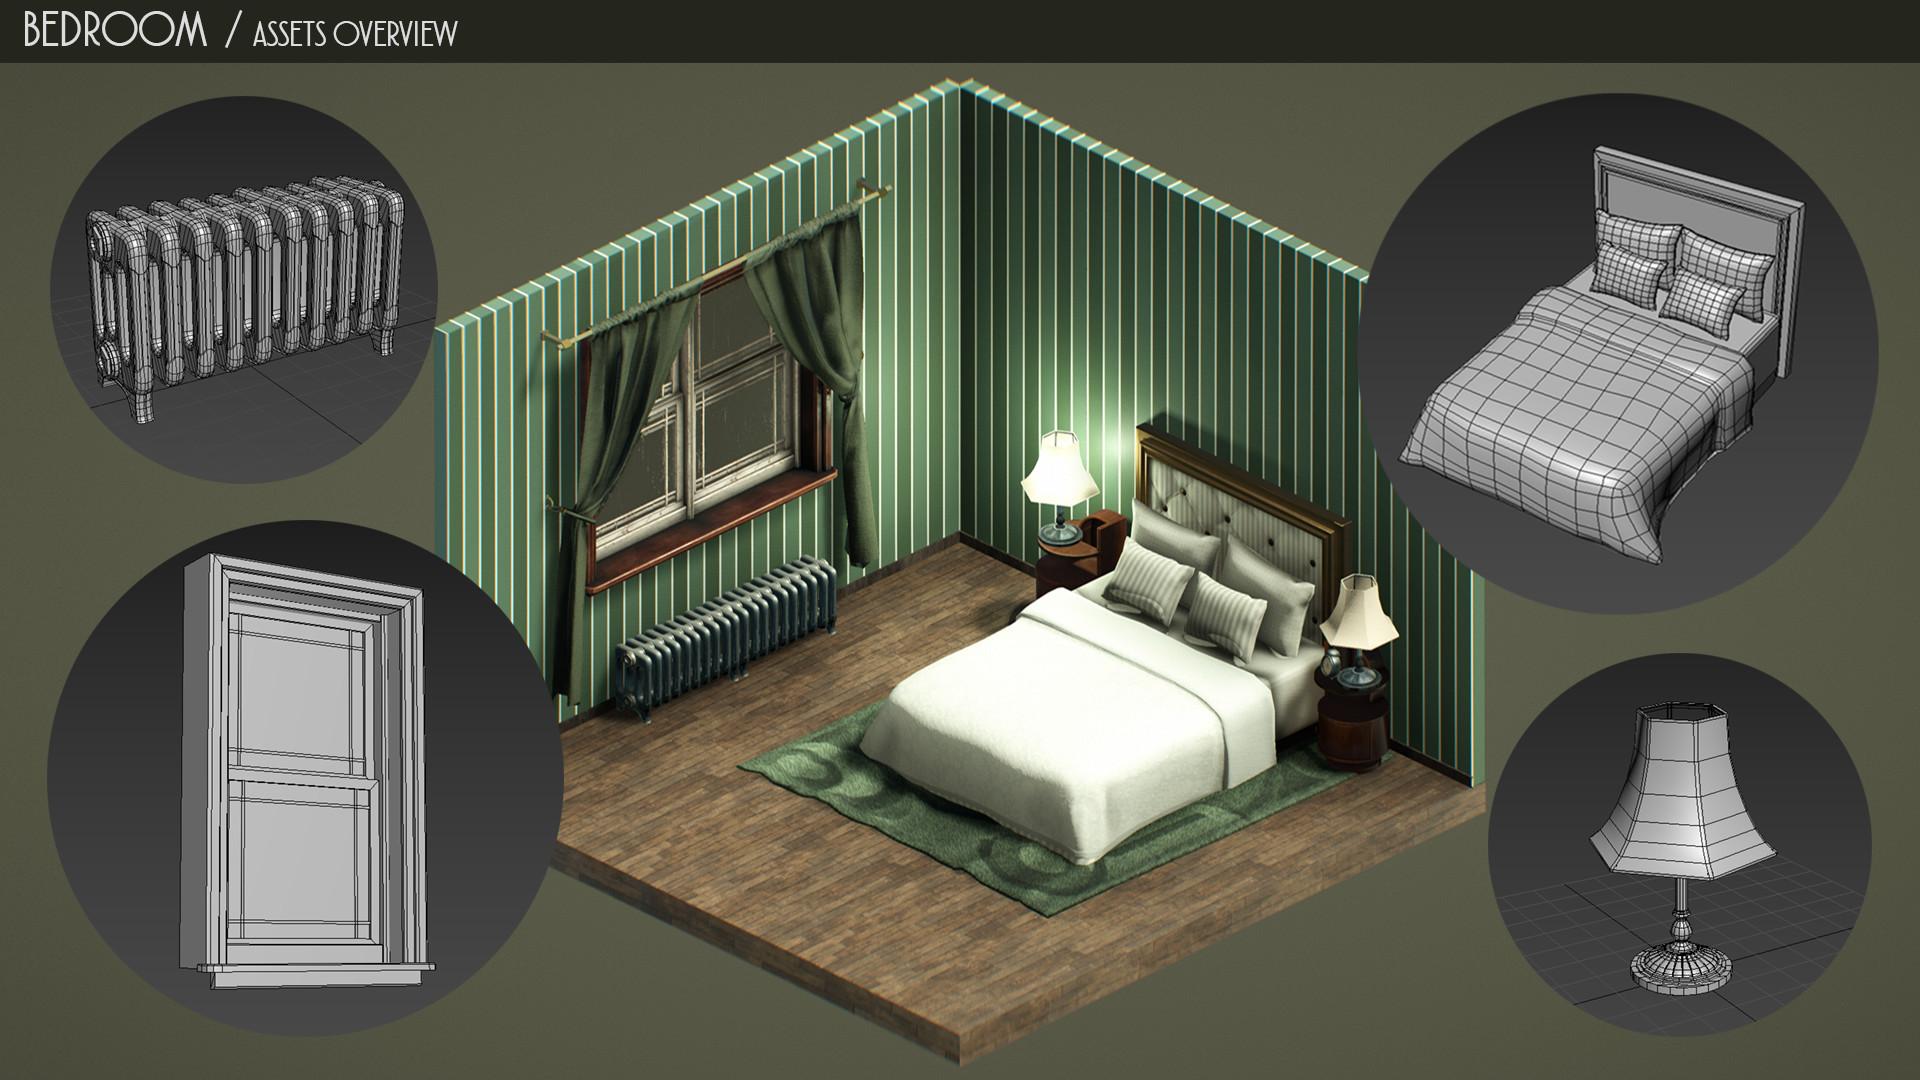 Augustin grassien bedroom assetsoverview